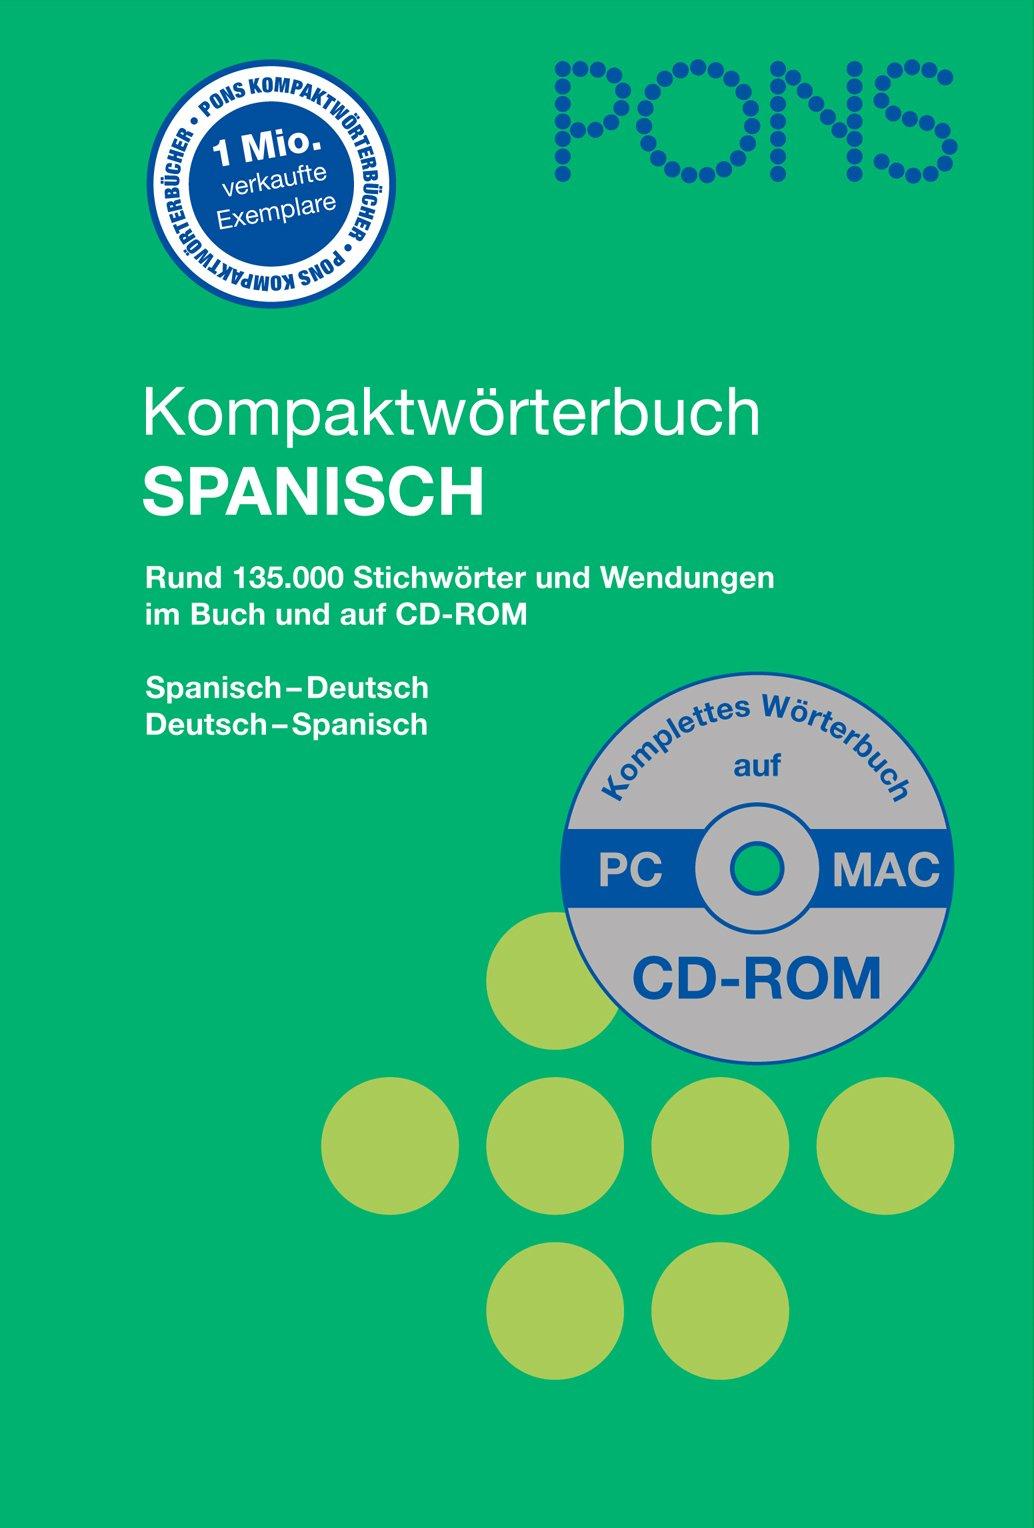 PONS Kompaktwörterbuch Spanisch mit CD-ROM: Spanisch-Deutsch/Deutsch-Spanisch